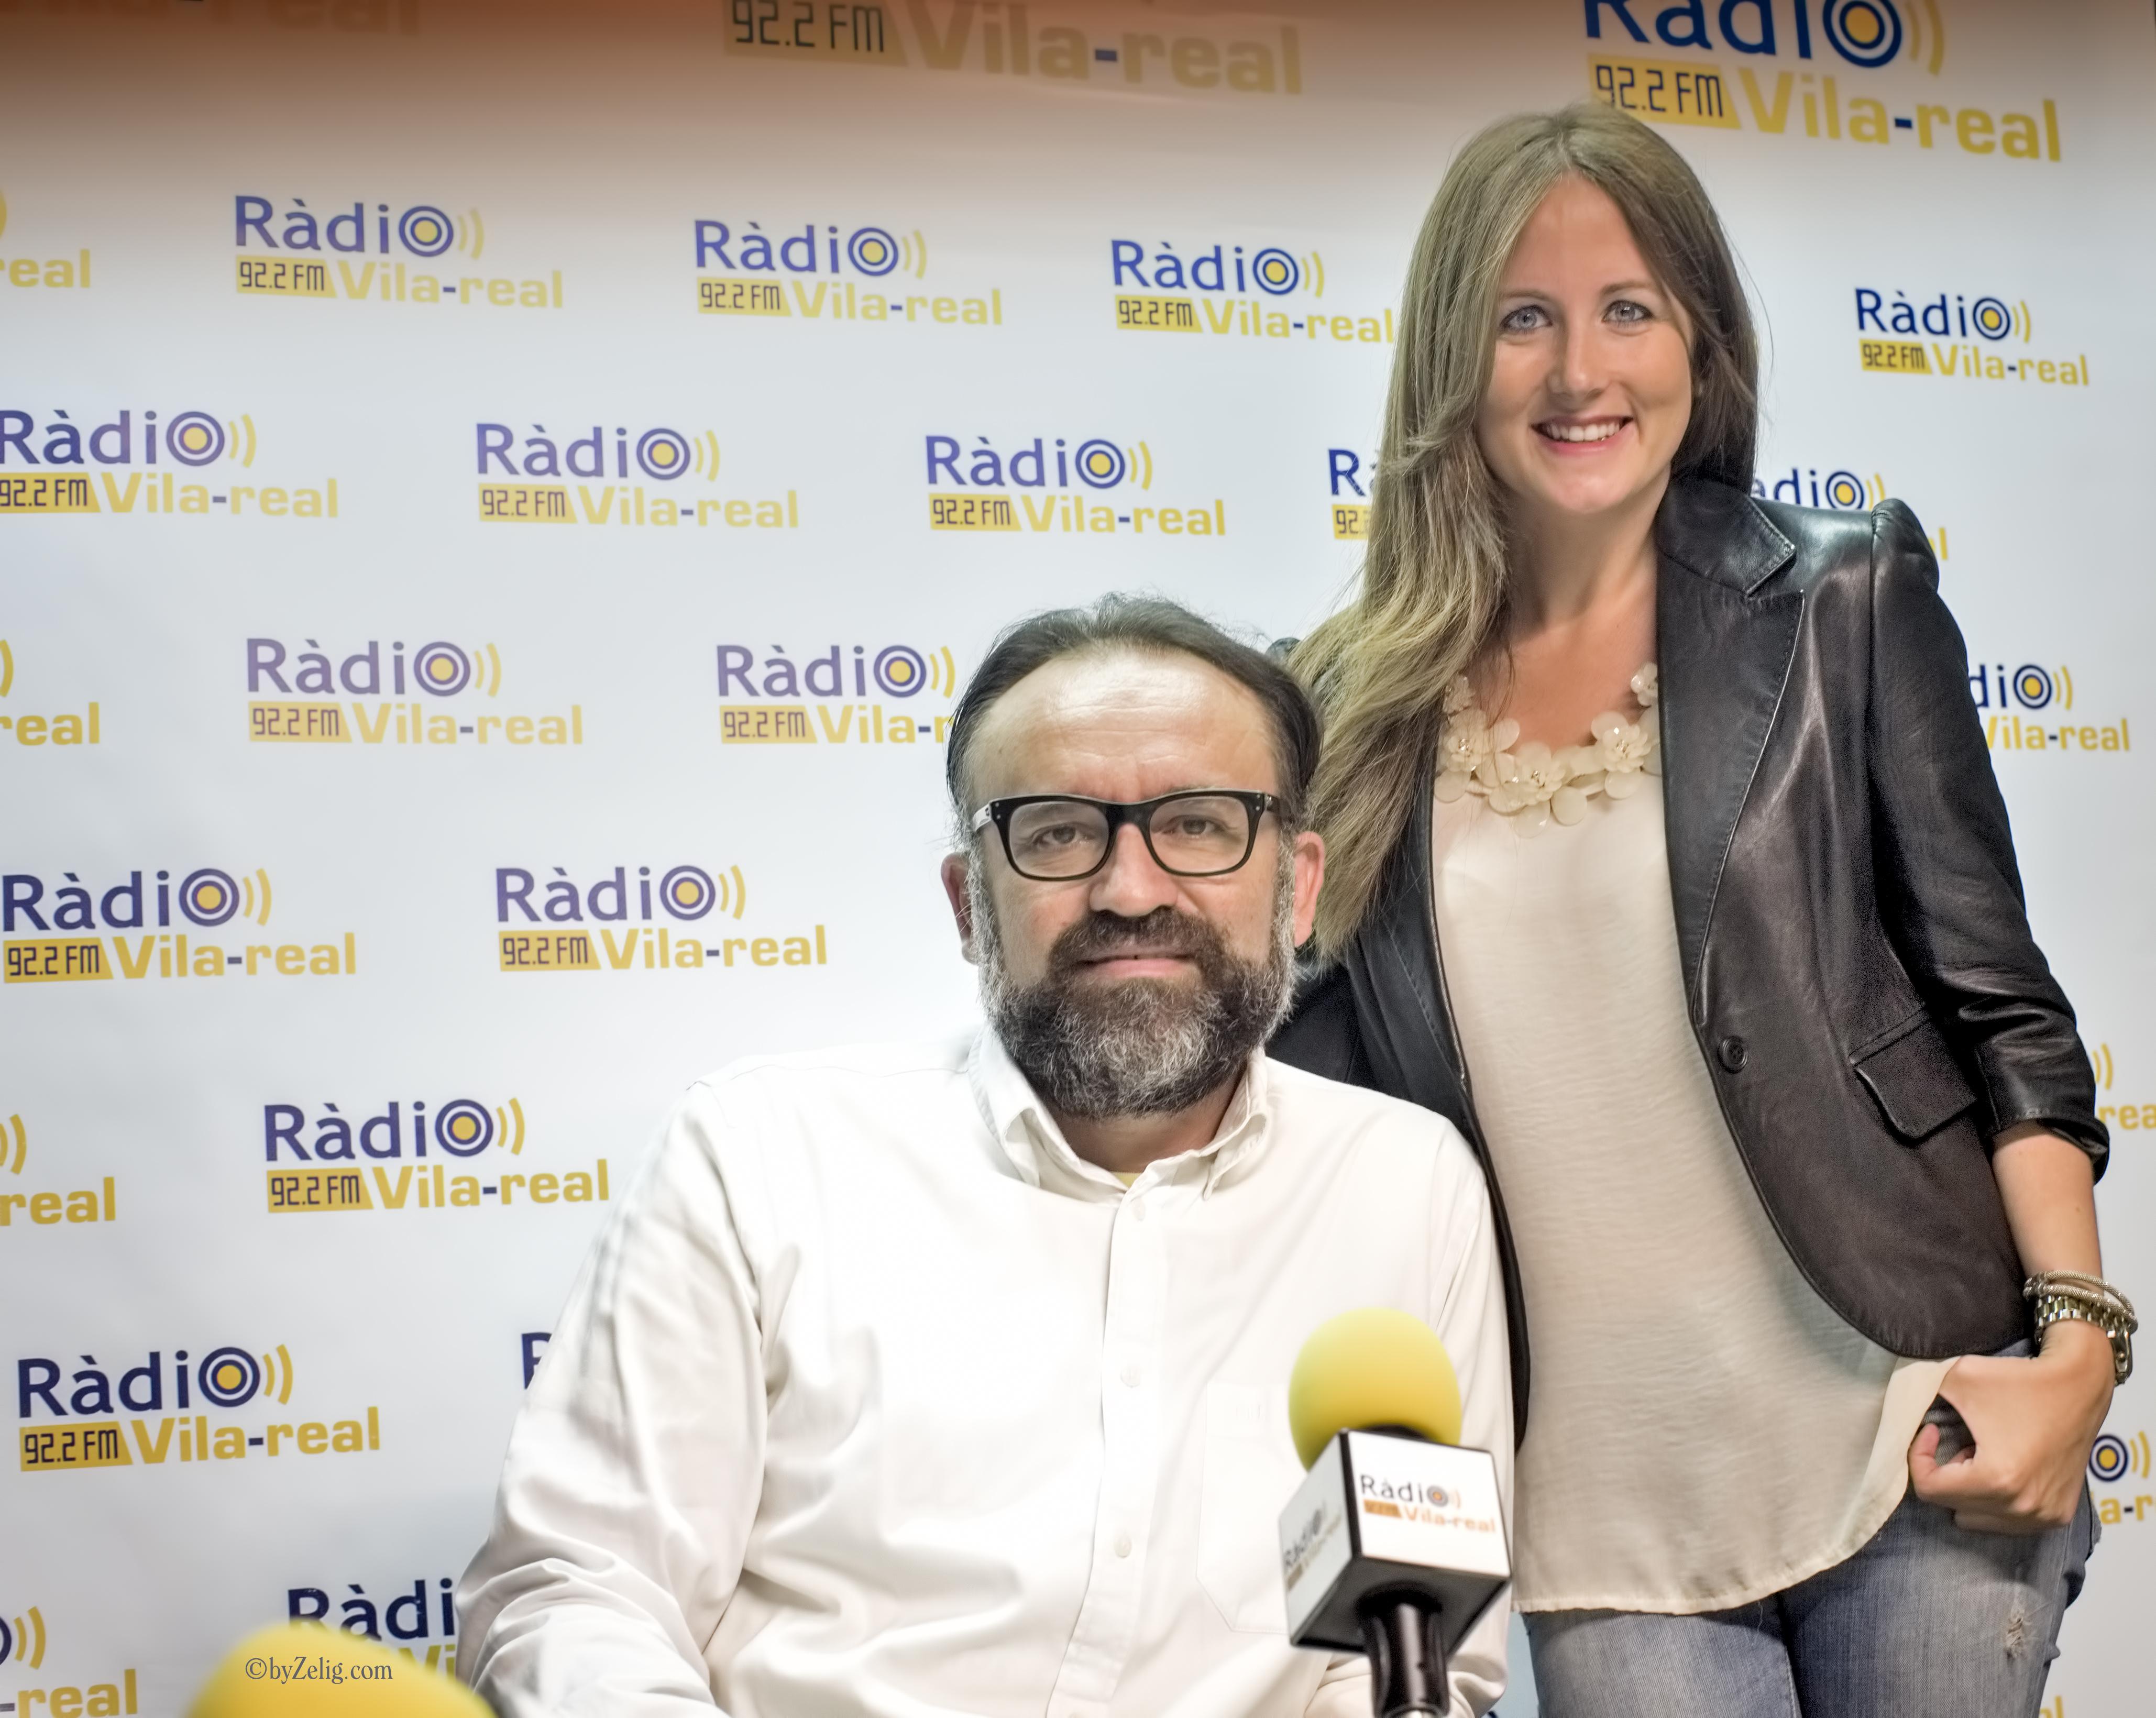 Esports Radio Vila-real. Programa del 11 de octubre 2017